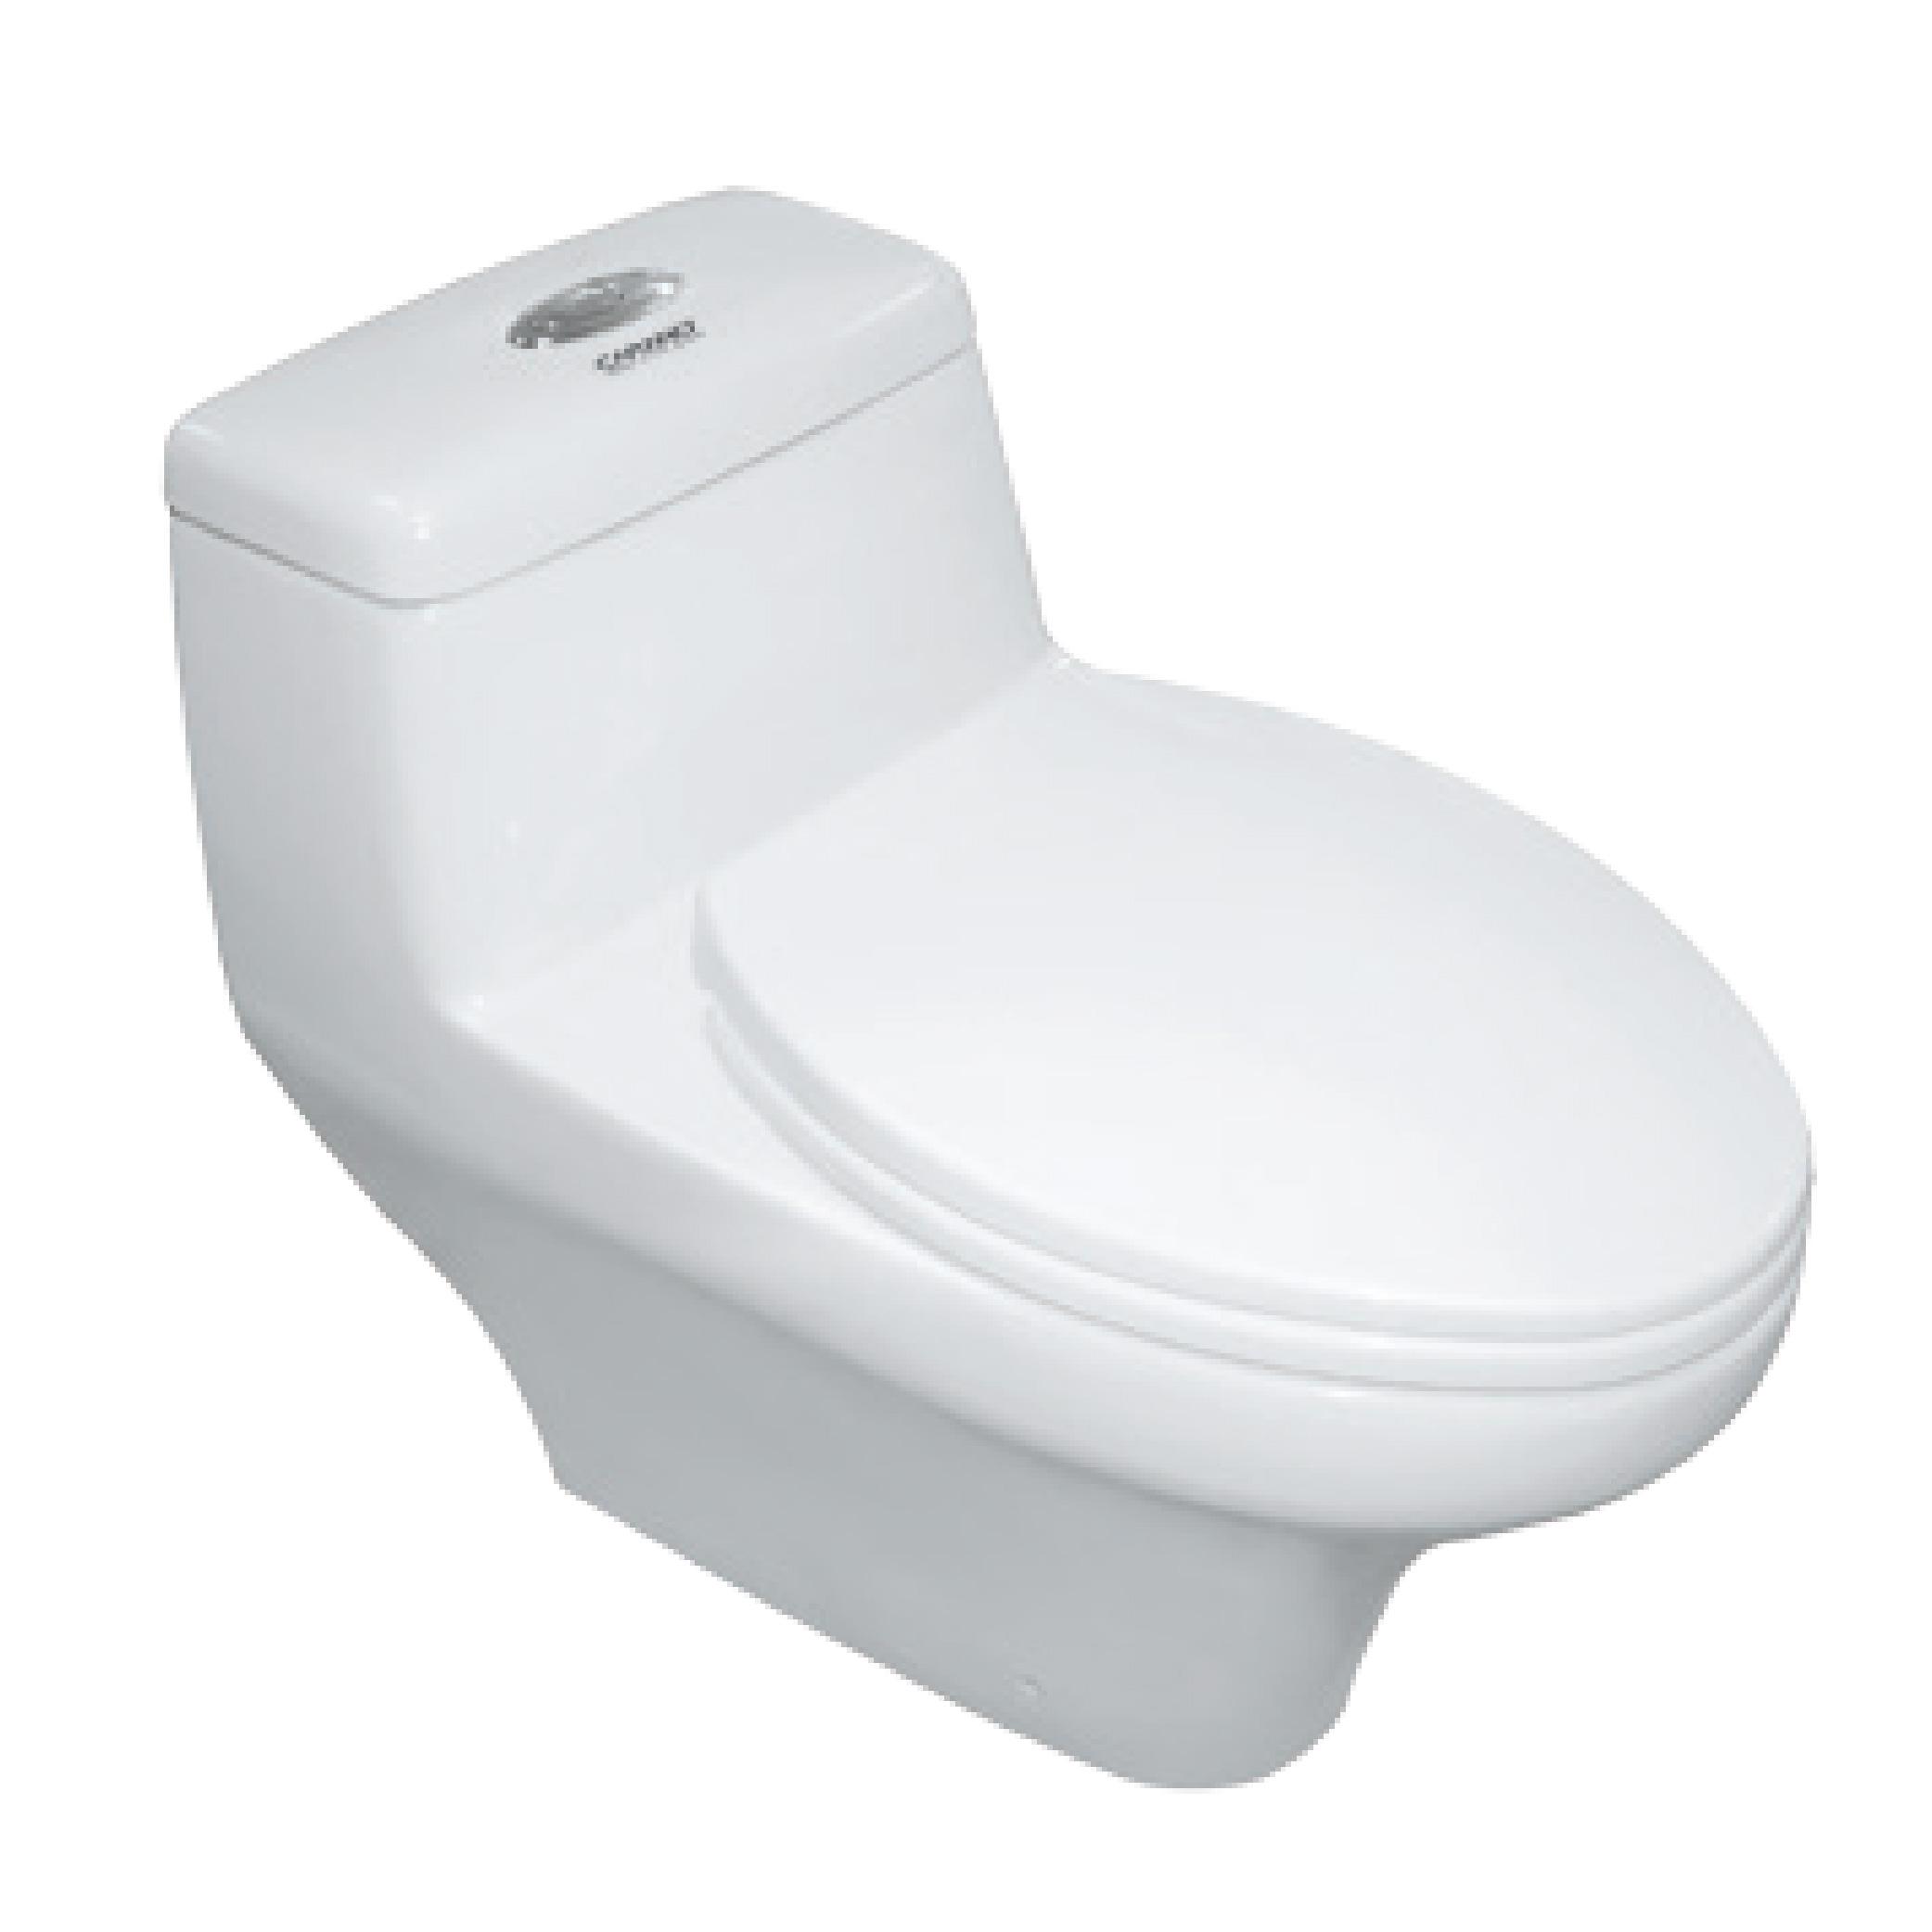 BỒN CẦU CARANO 1 KHỐI MC1622 ( Toilet model: MC1622 )